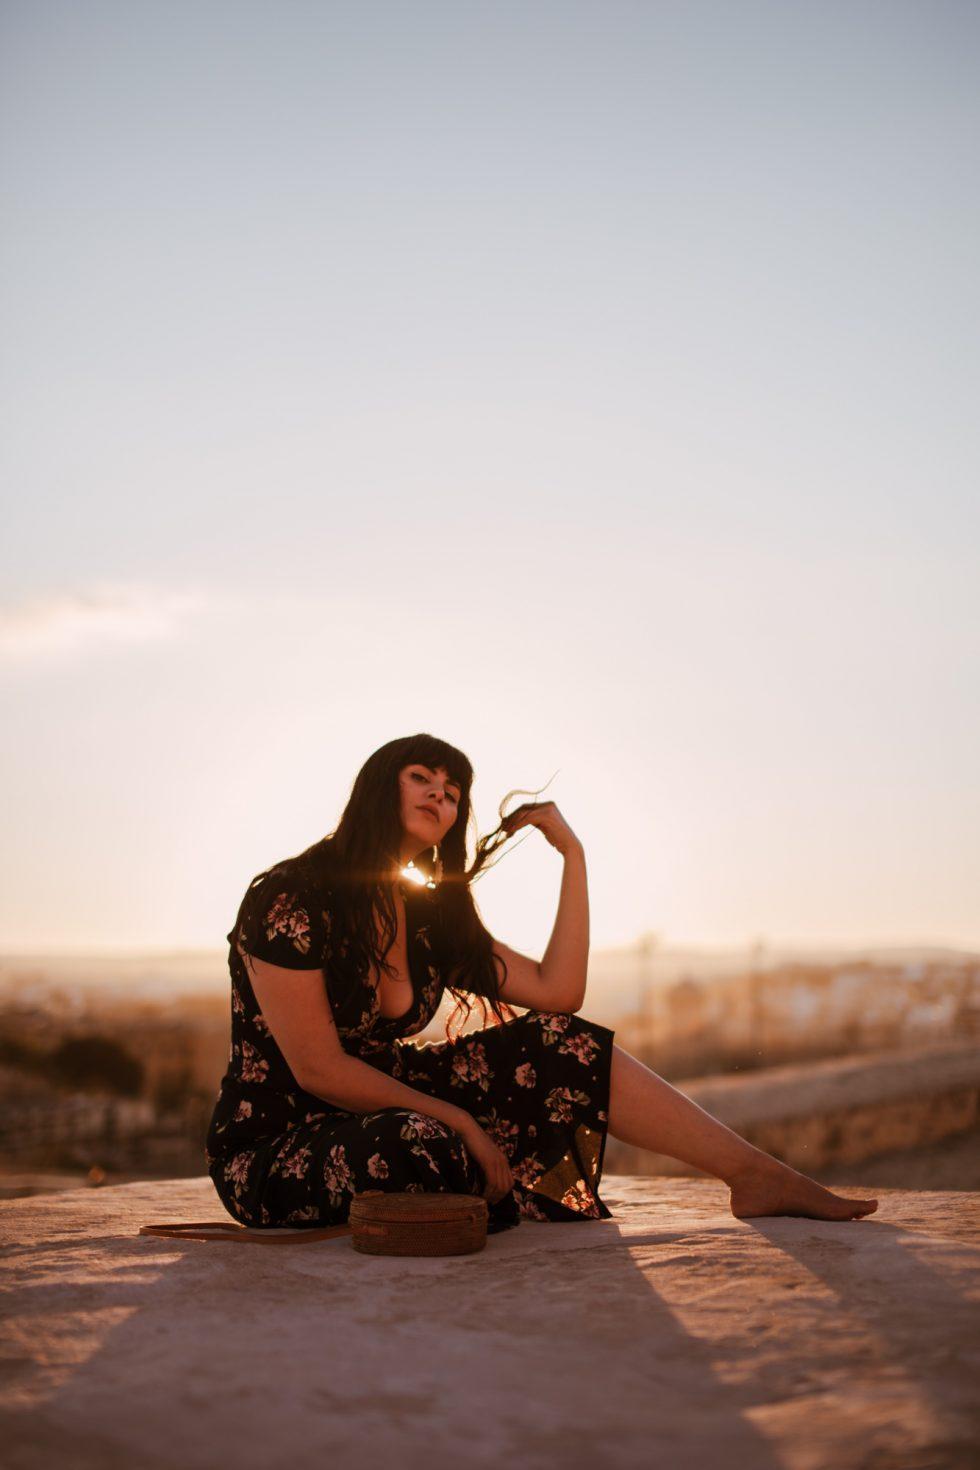 malta-portrait-travel-lifestyle-photographer-laura-g-diaz